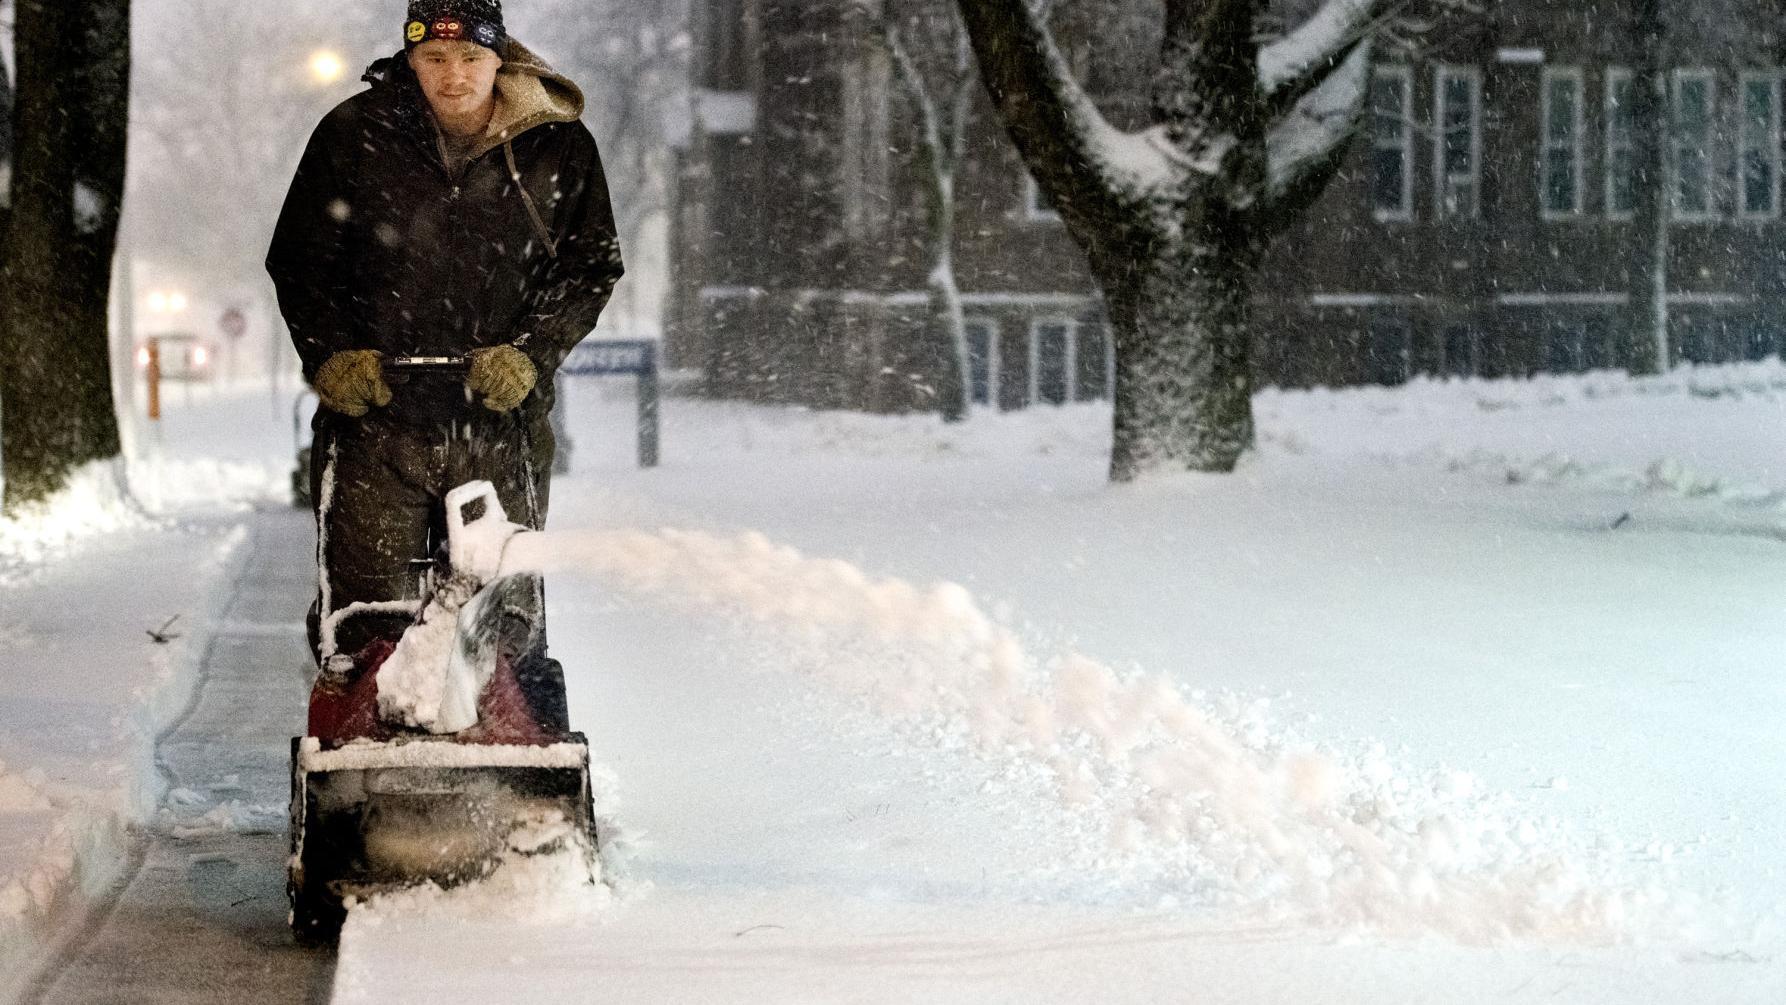 NE Iowa may miss brunt of major snowstorm